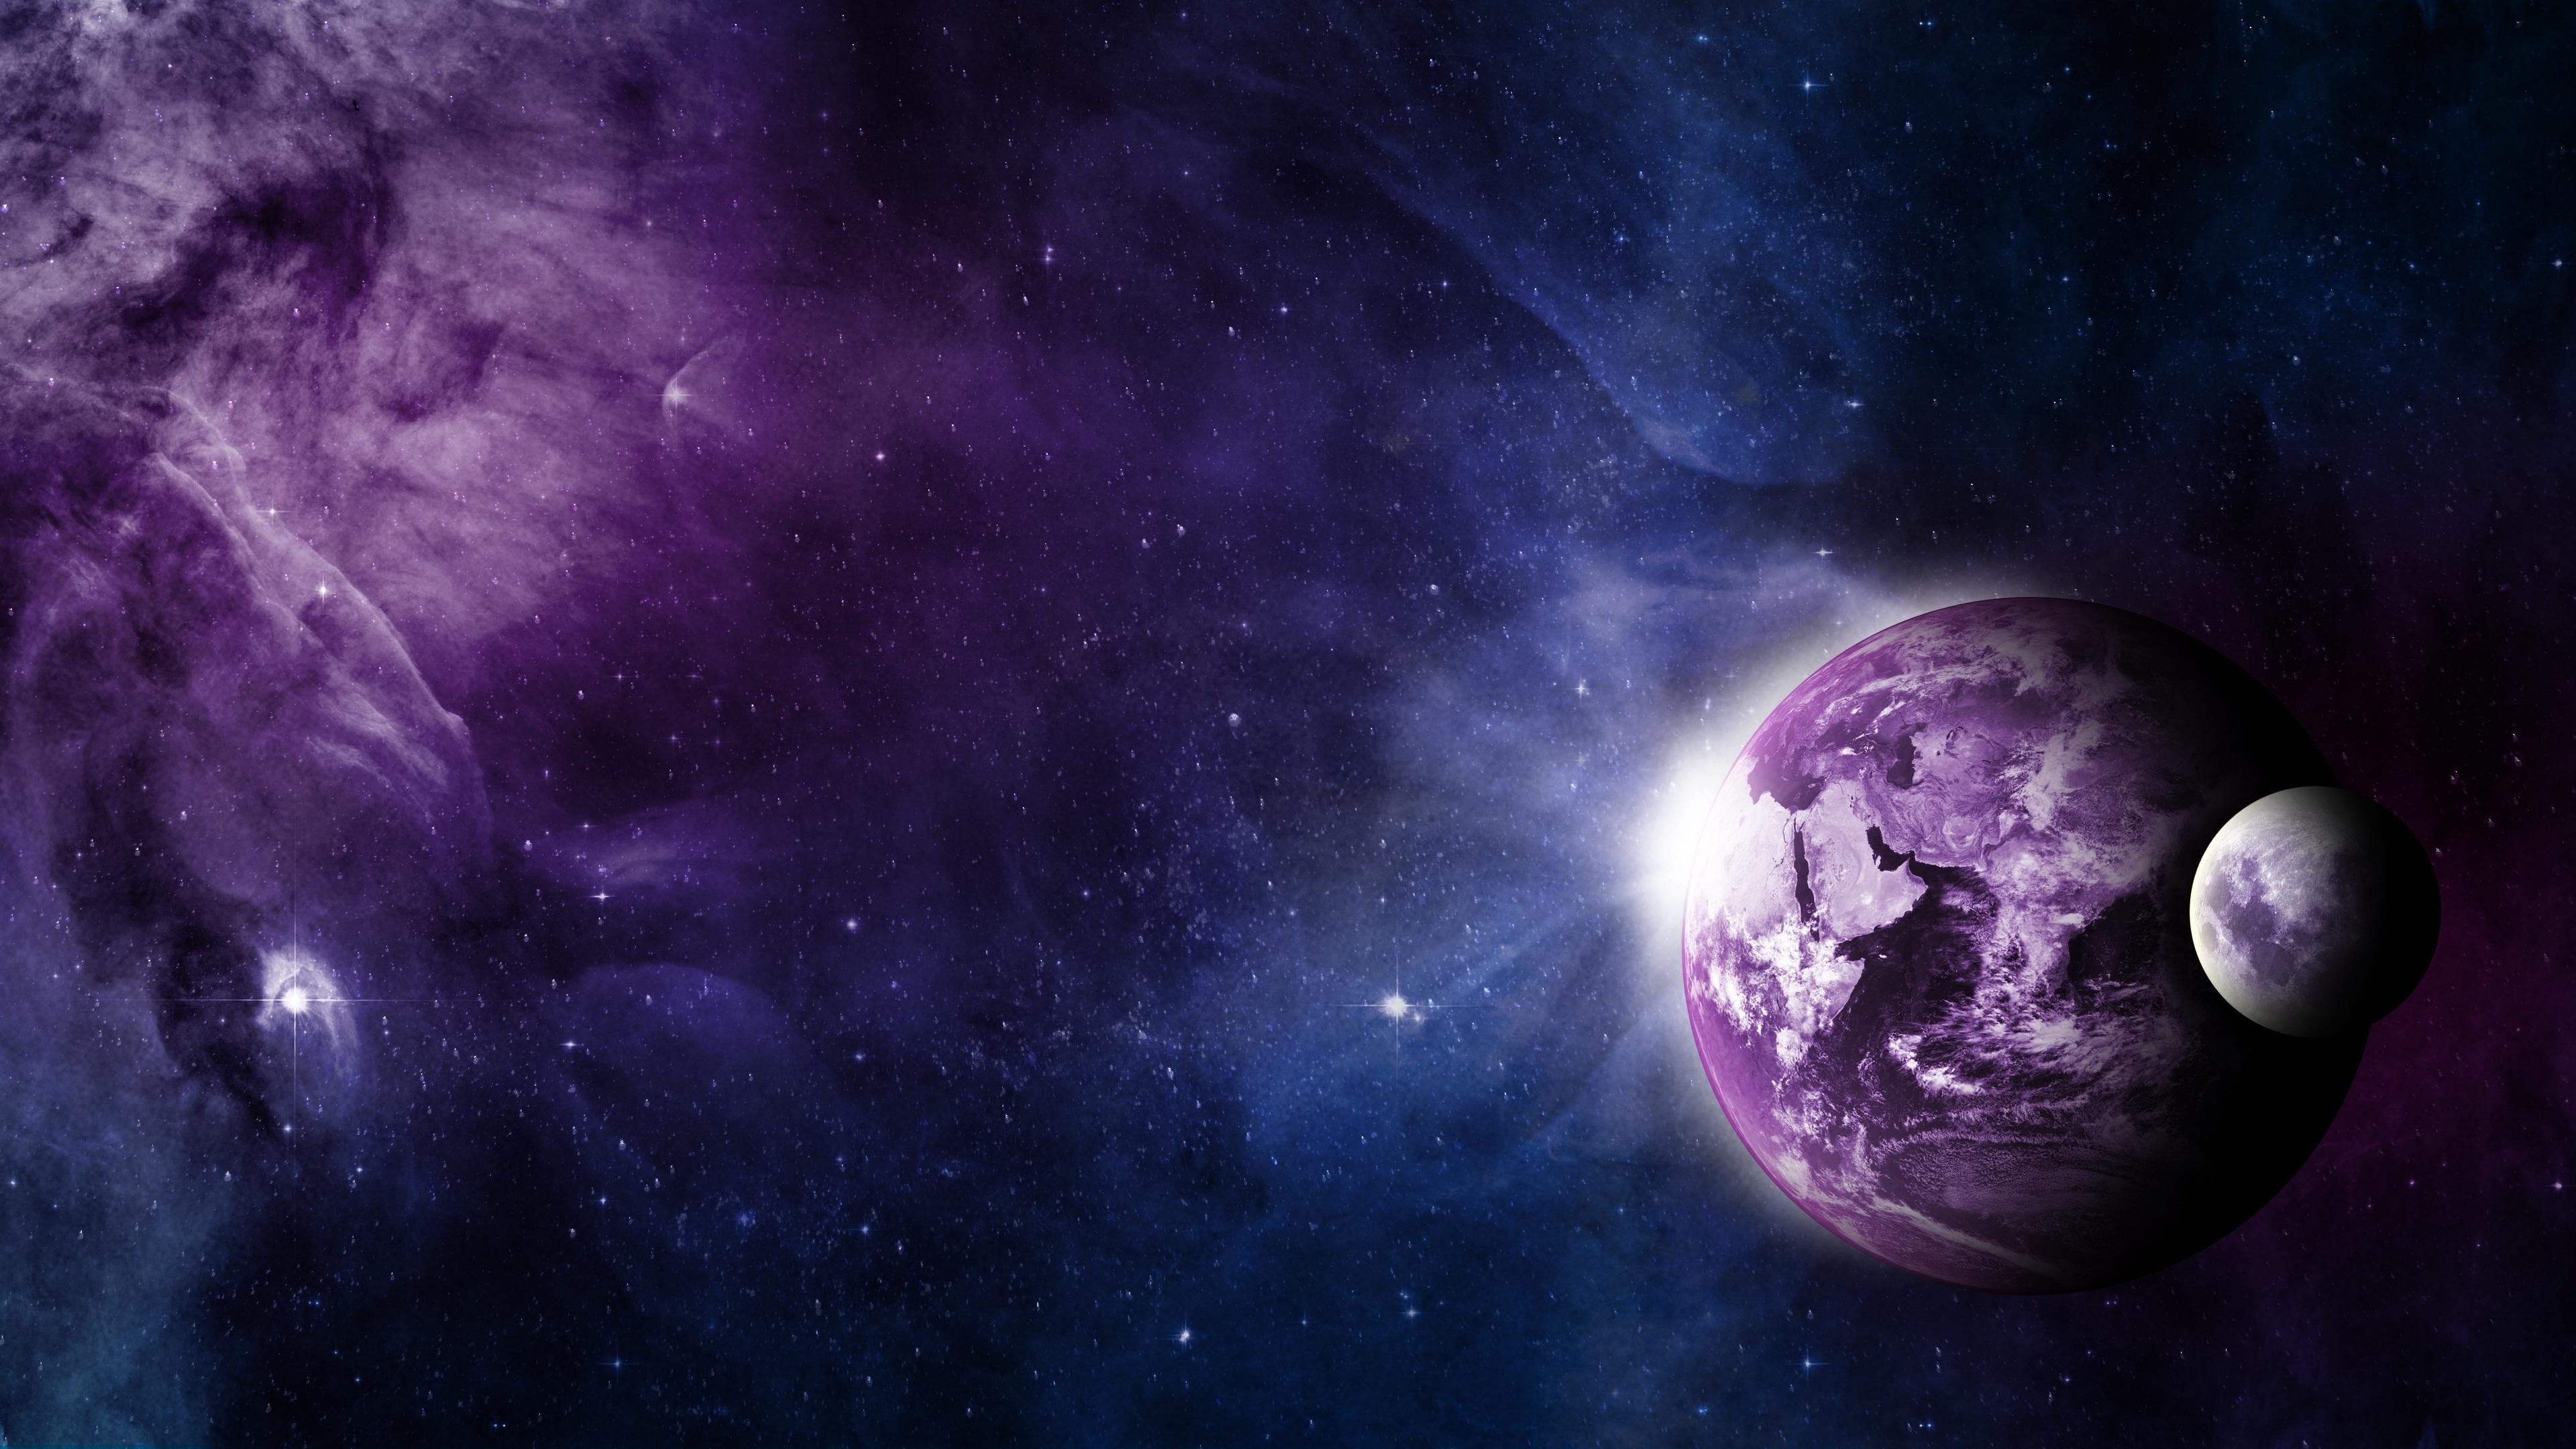 wallpaper earth, moon, universe, purple style 3840x2160 uhd 4k